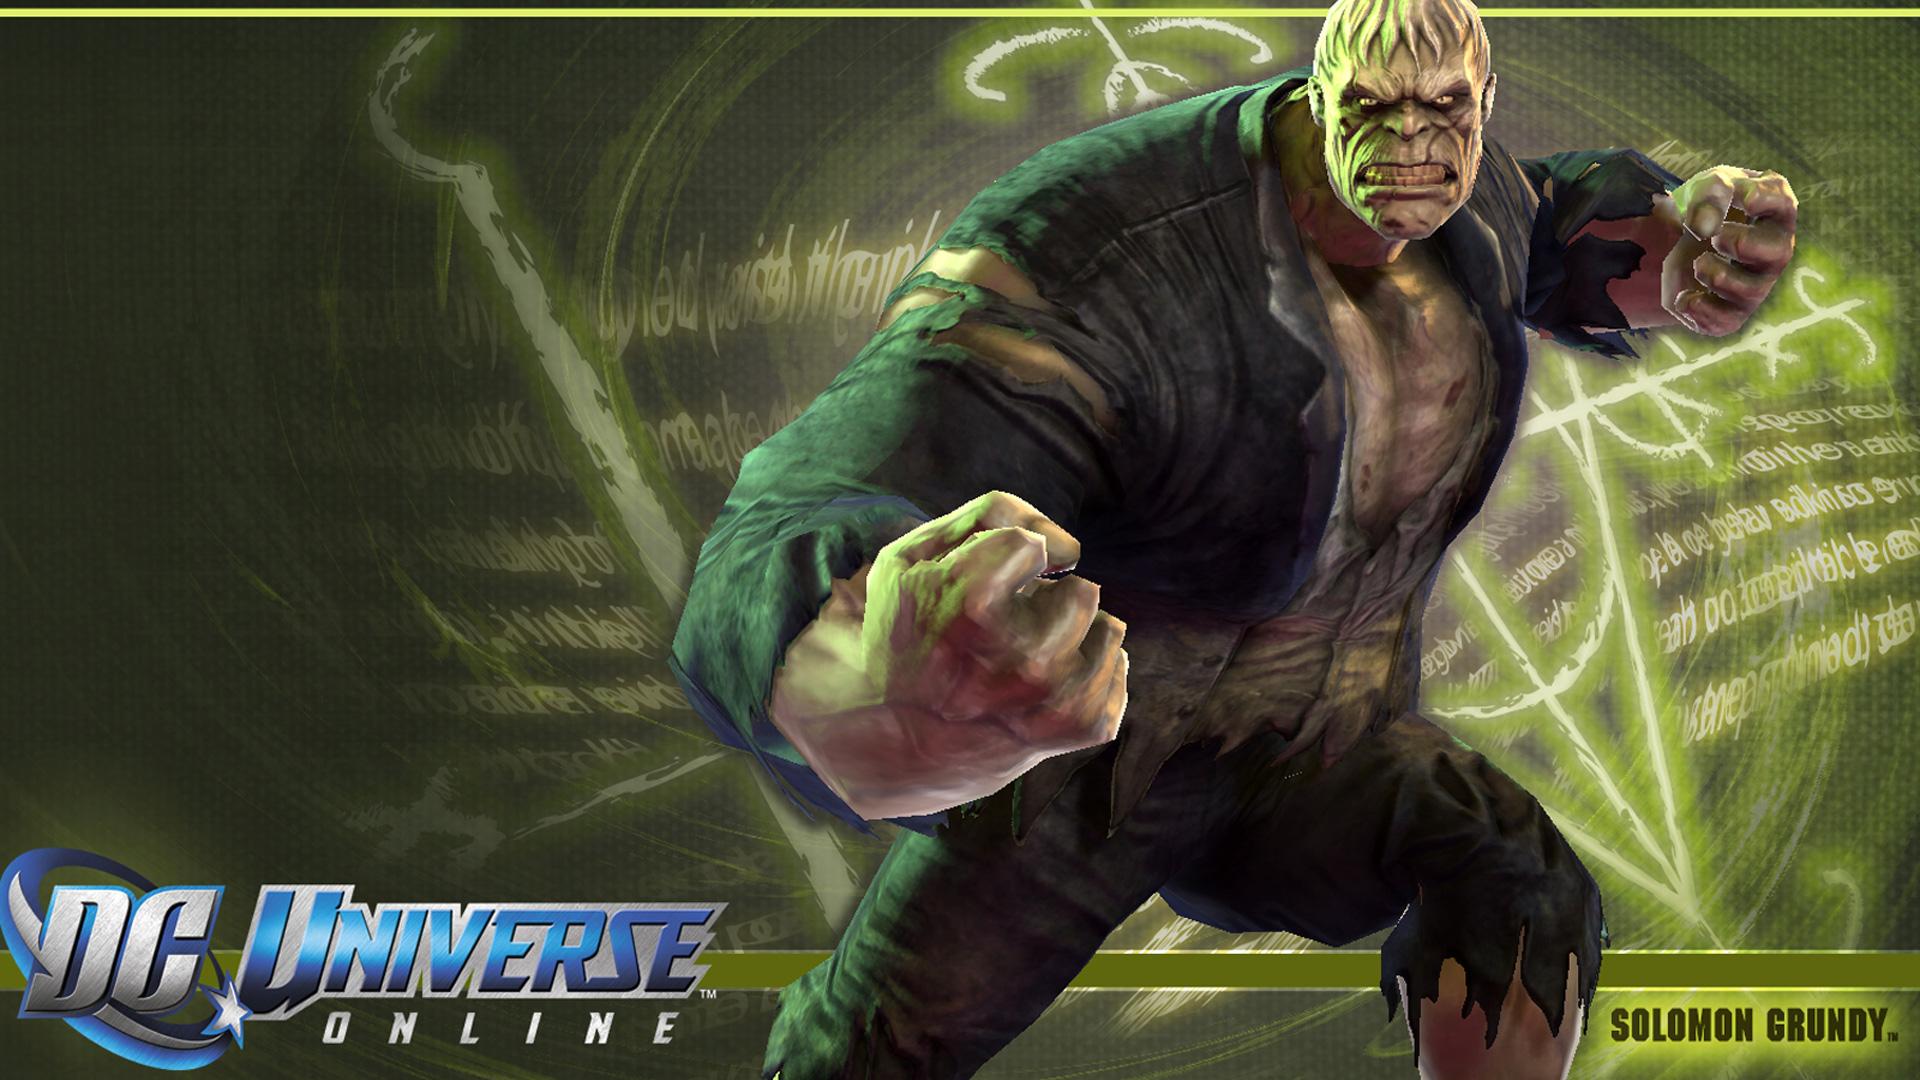 Free DC Universe Online Wallpaper in 1920x1080